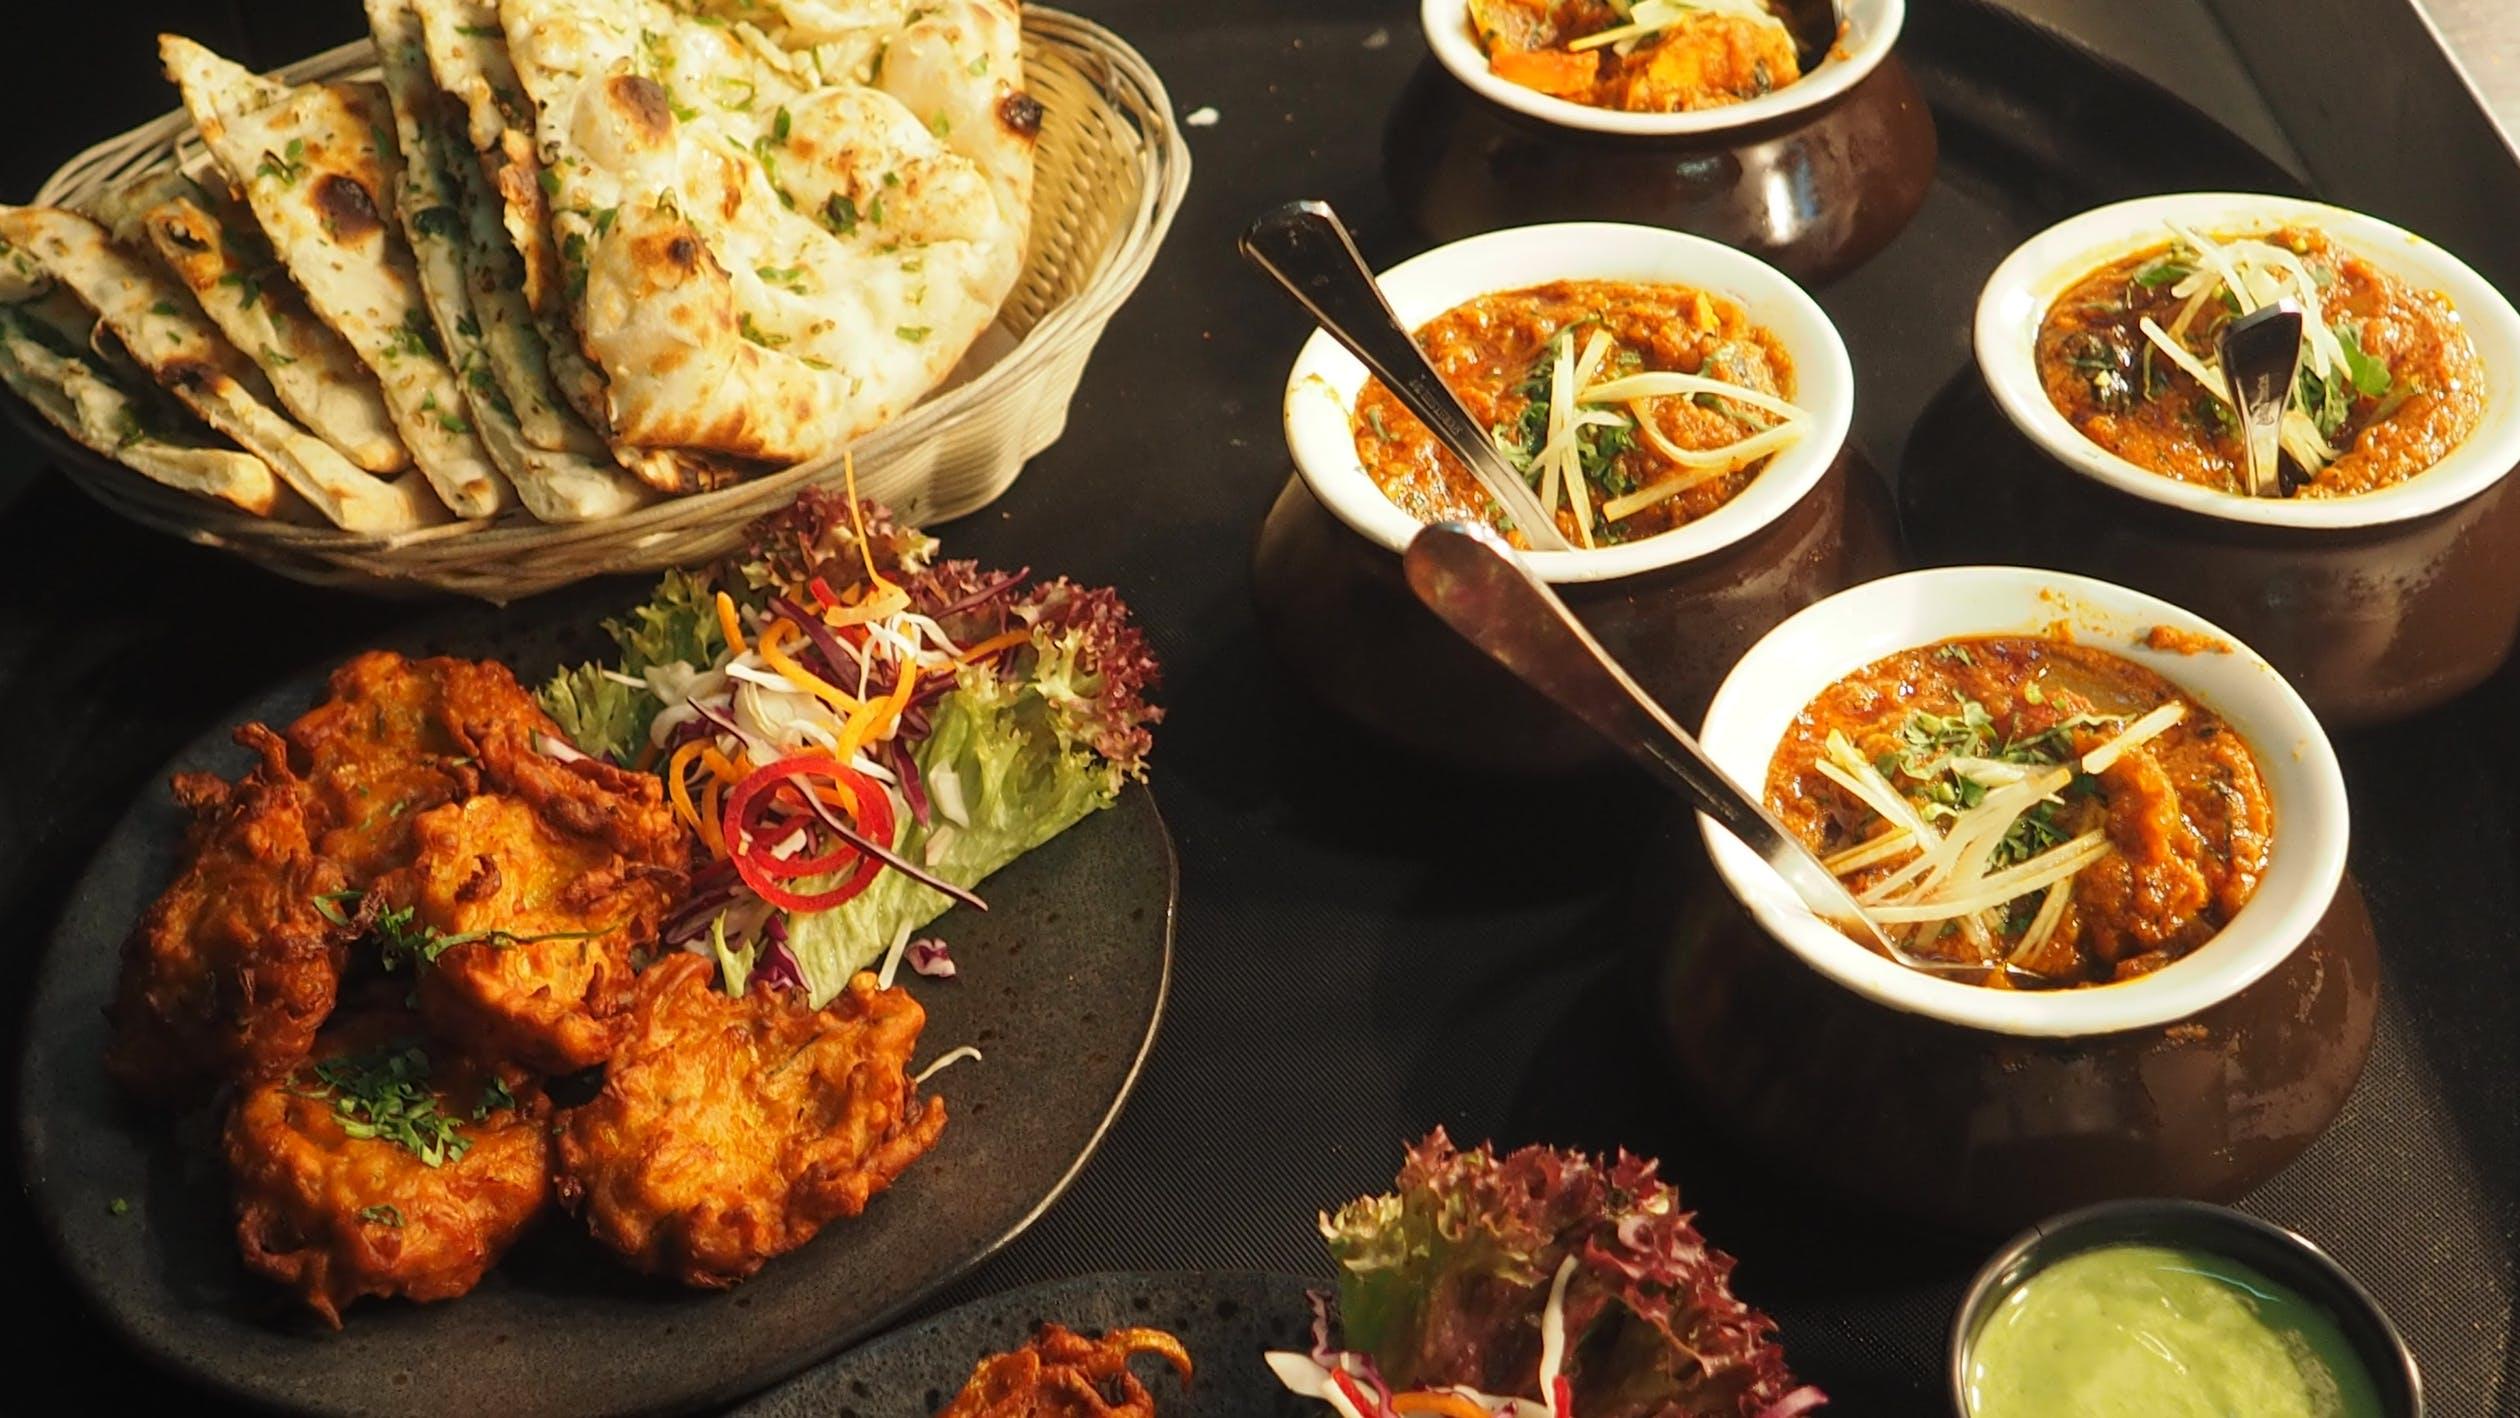 20 of Medellin's Best Restaurants to Satisfy 20 Different Cravings